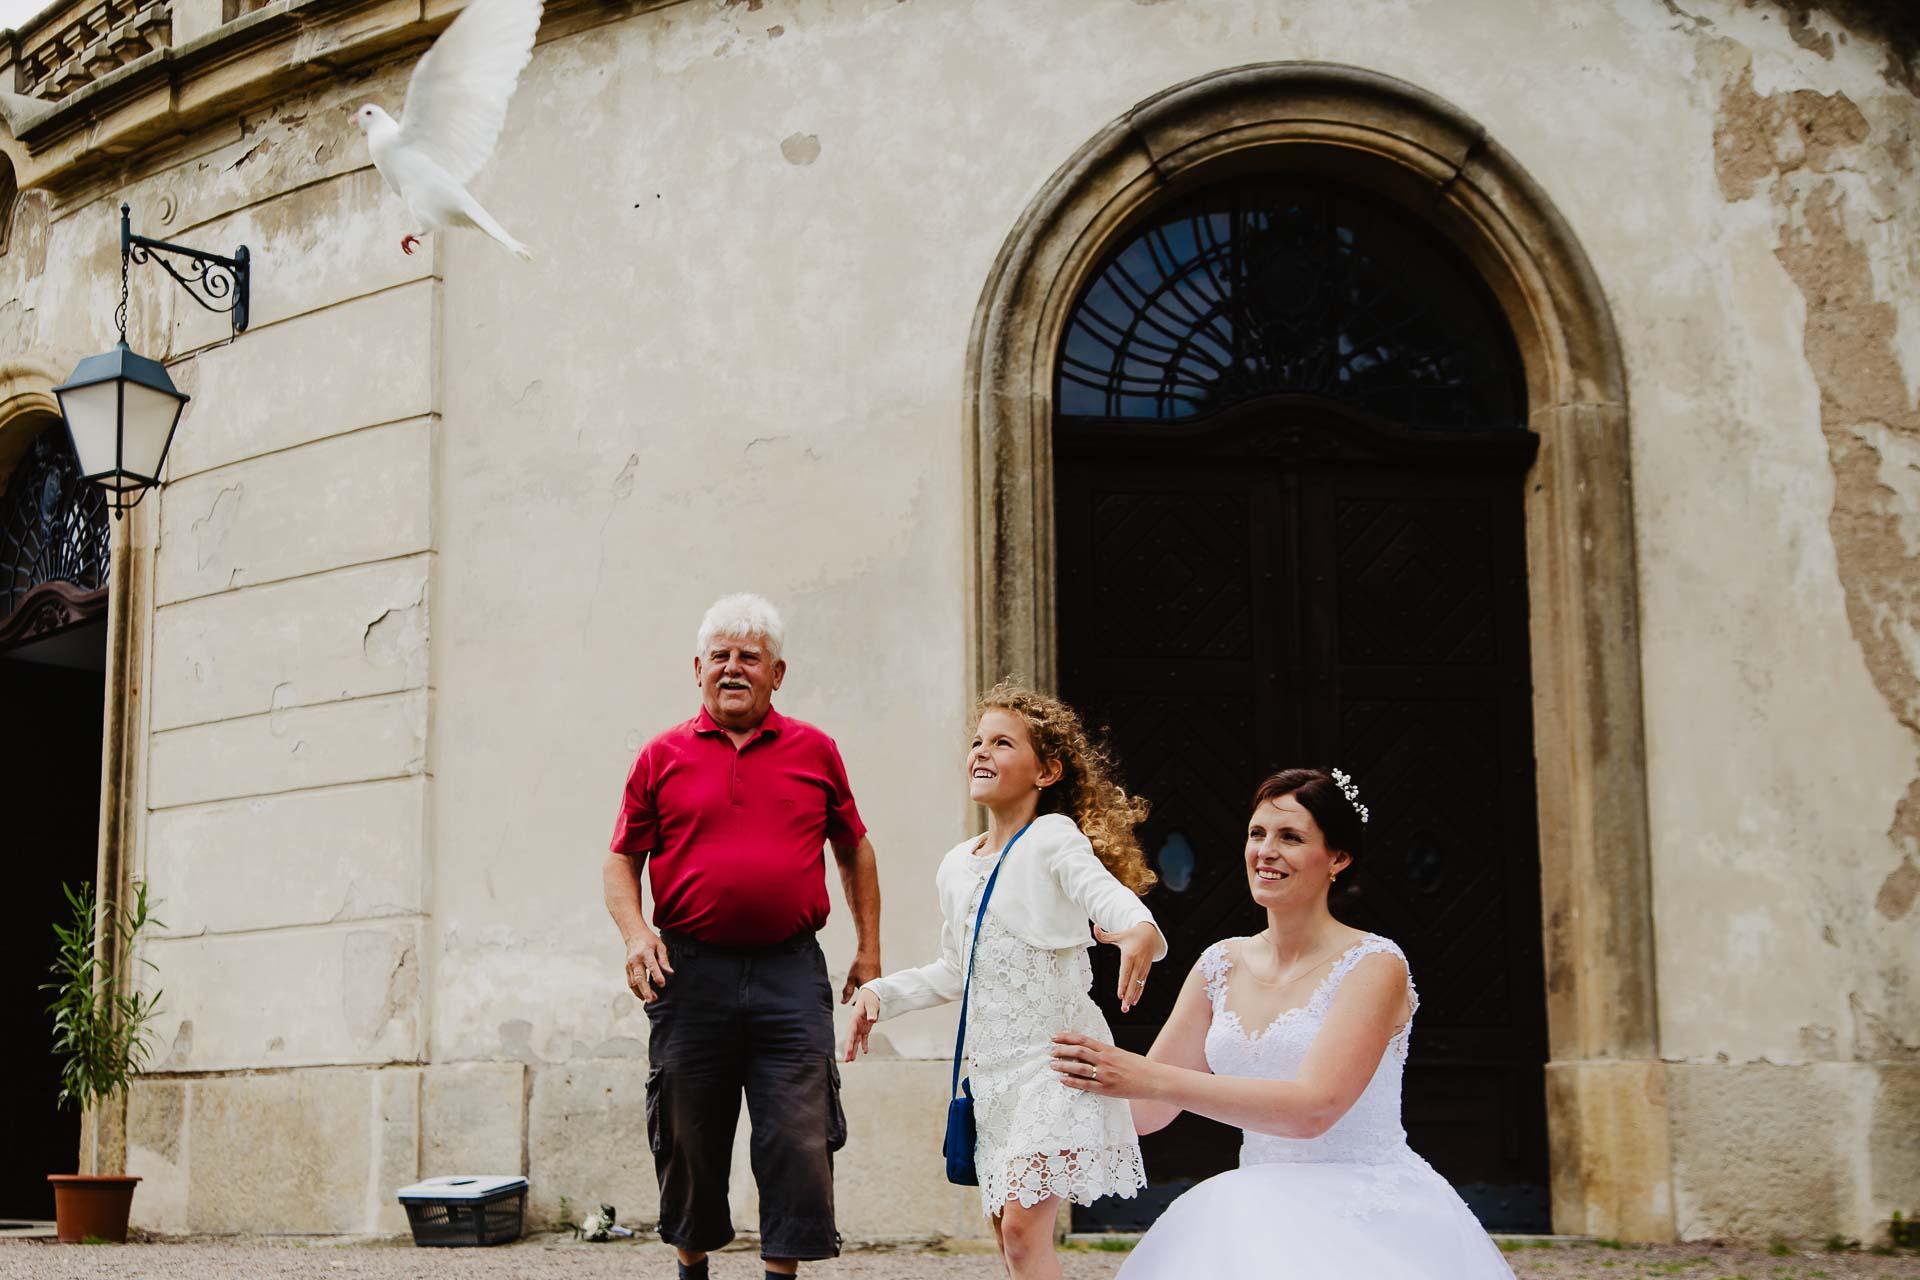 Svatební-fotograf-zámek-Karlova-Koruna-Chlumec-nad-Cidlinou-123